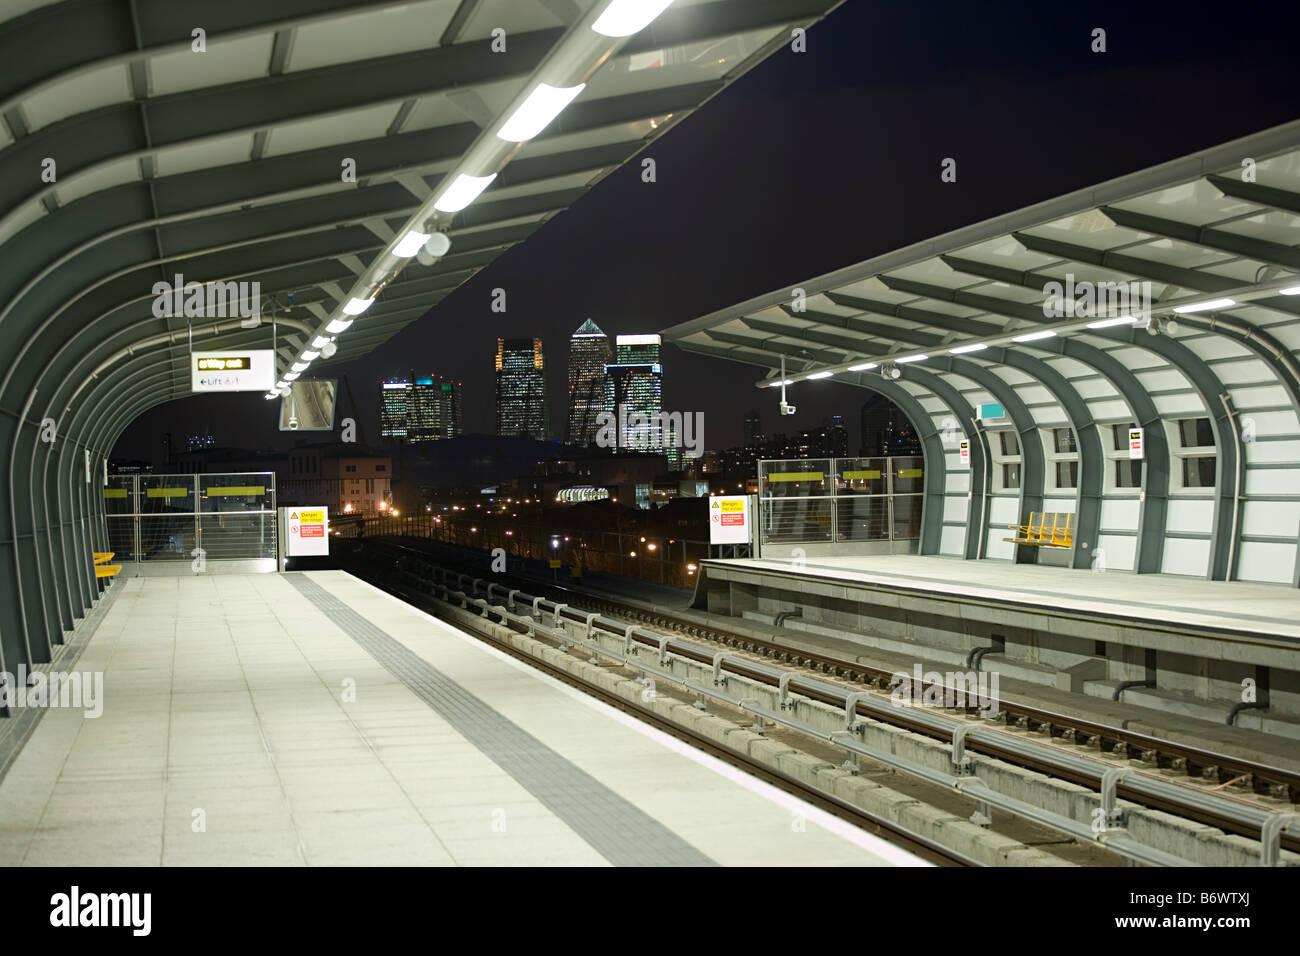 DLR station - Stock Image